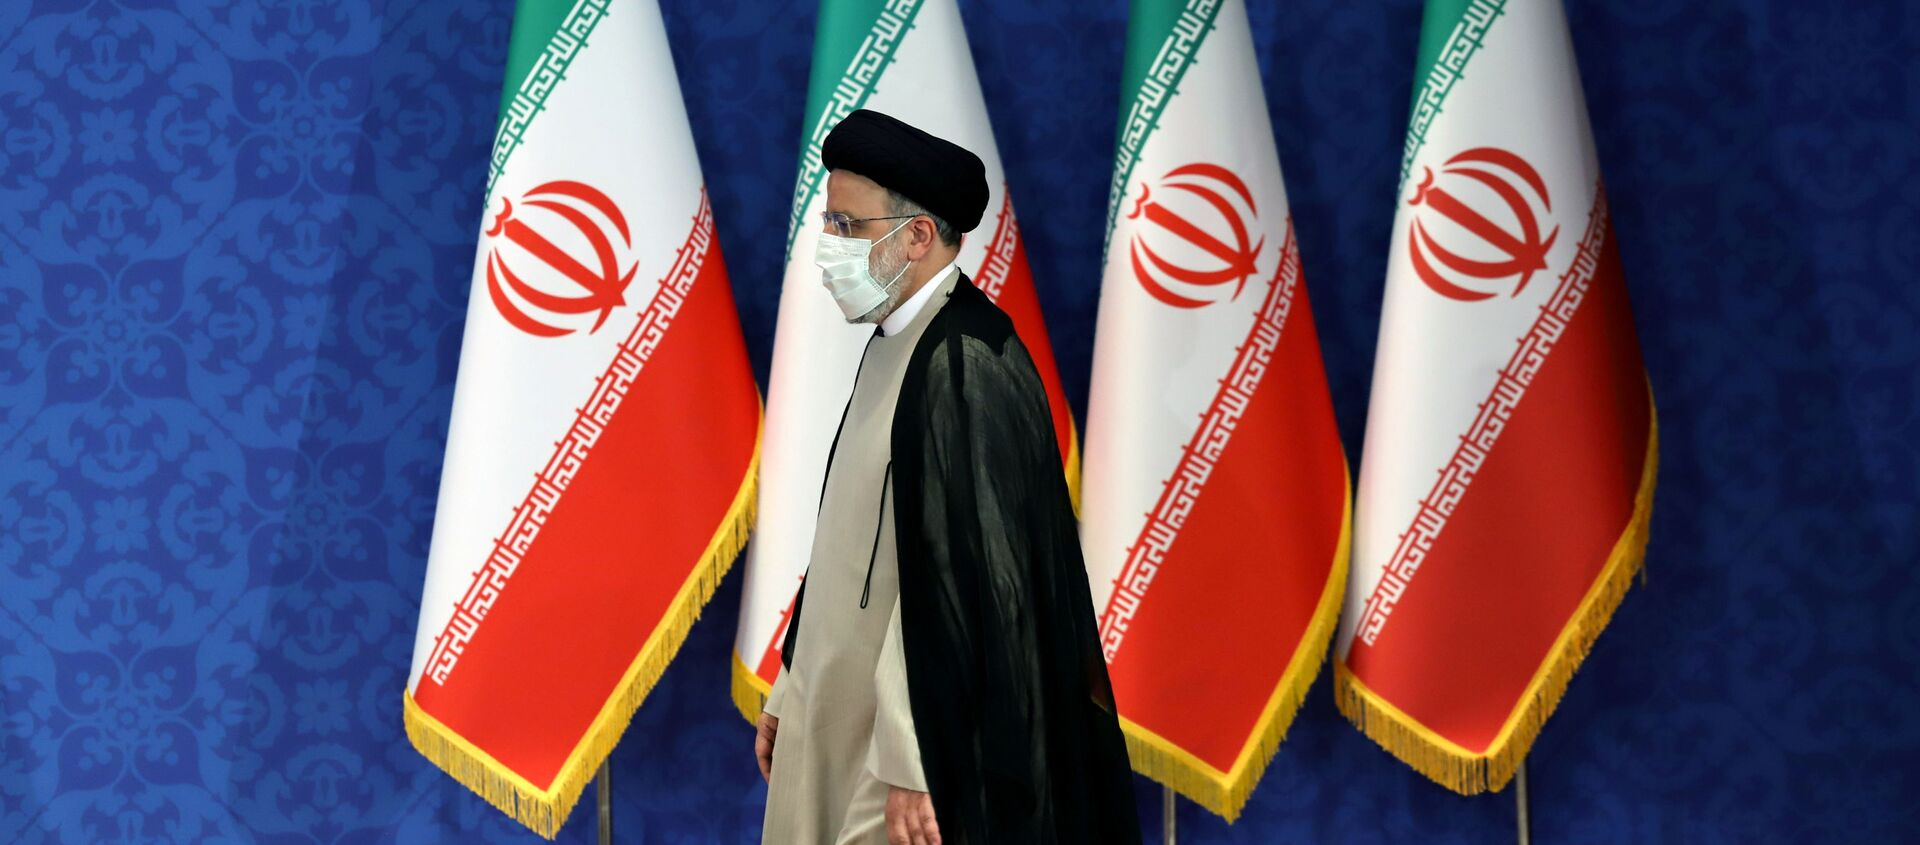 Iran's President-elect Ebrahim Raisi attends a news conference in Tehran, Iran June 21, 2021. Majid Asgaripour/WANA (West Asia News Agency) via REUTERS  - Sputnik International, 1920, 09.08.2021